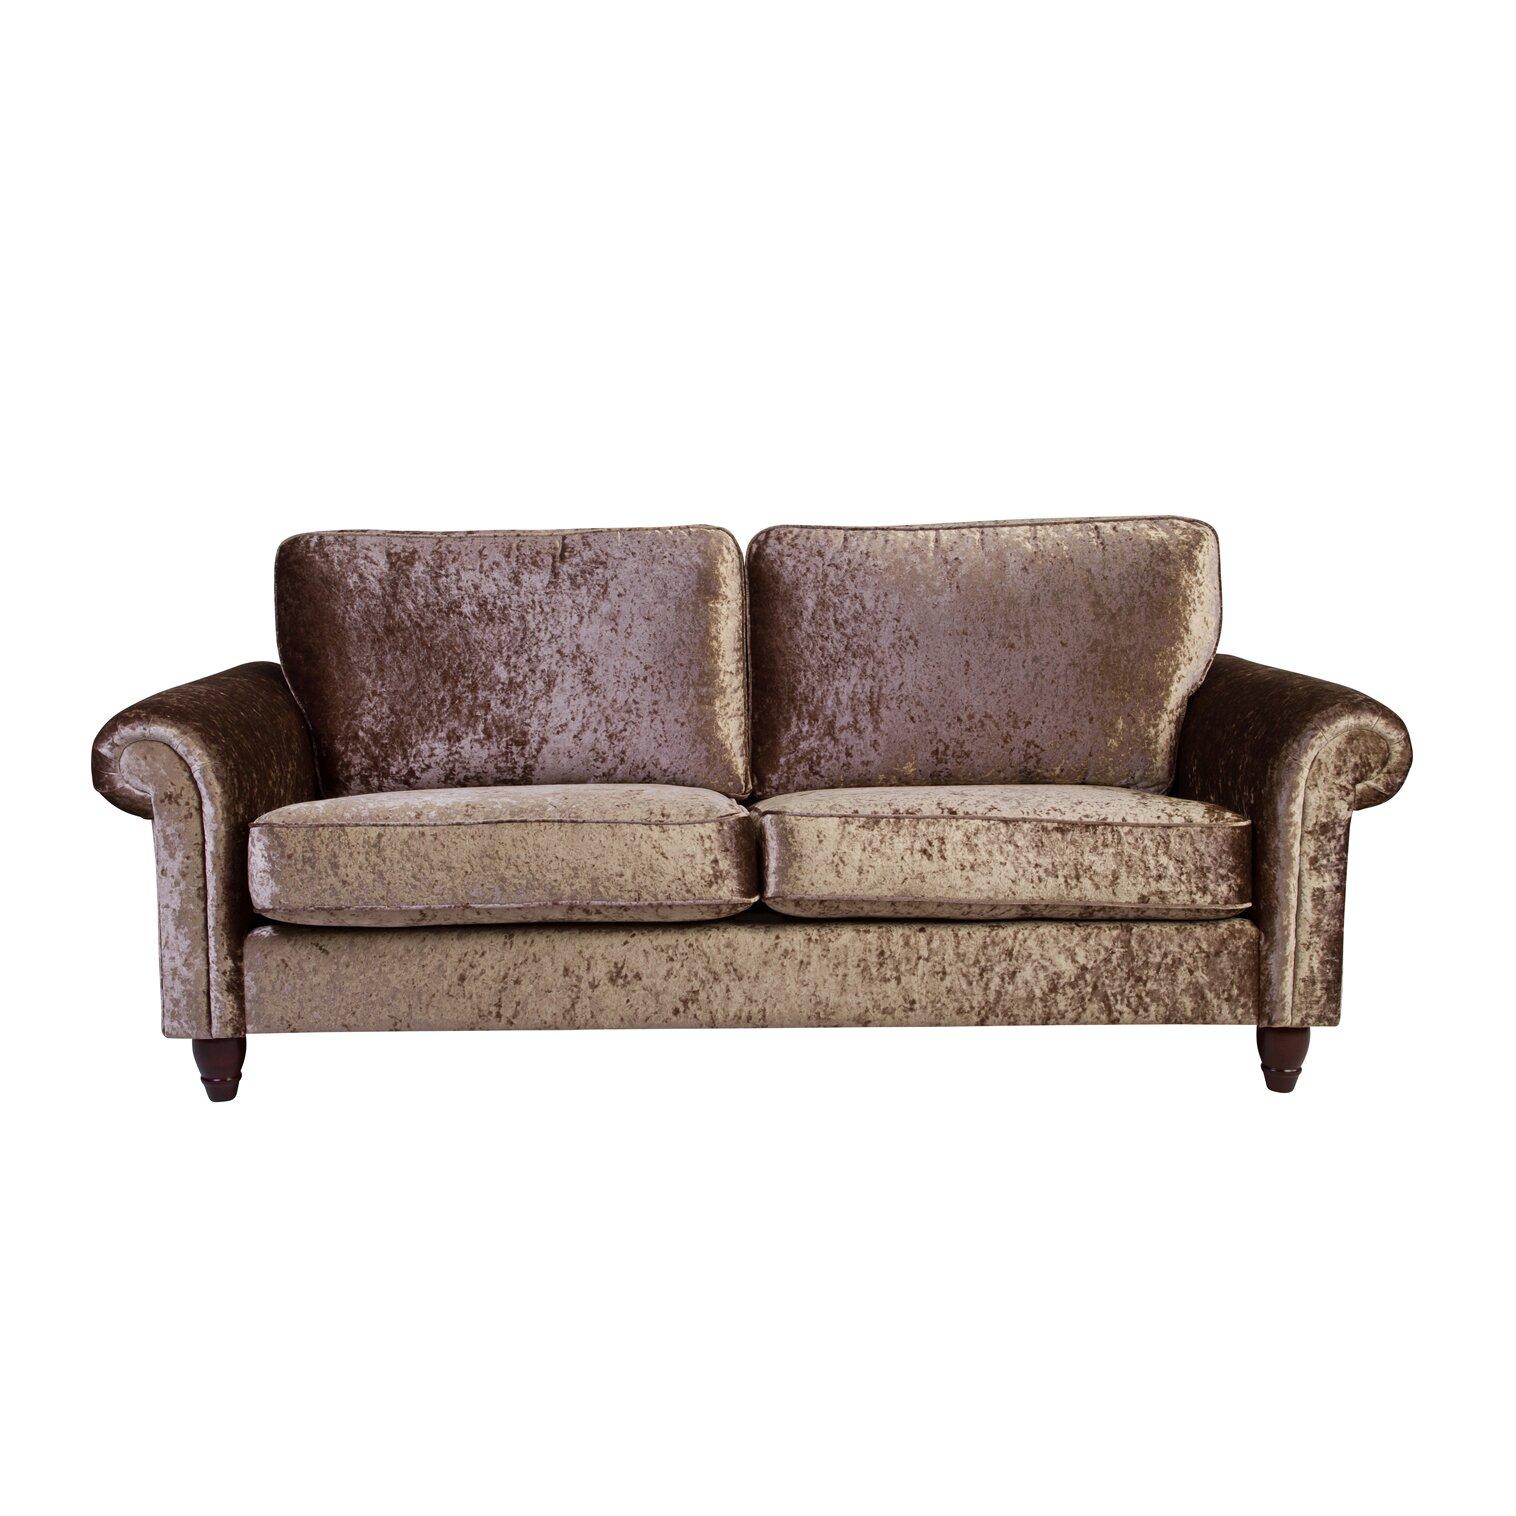 Fairmont park 3 sitzer sofa bridlington bewertungen Sofa dampfreiniger